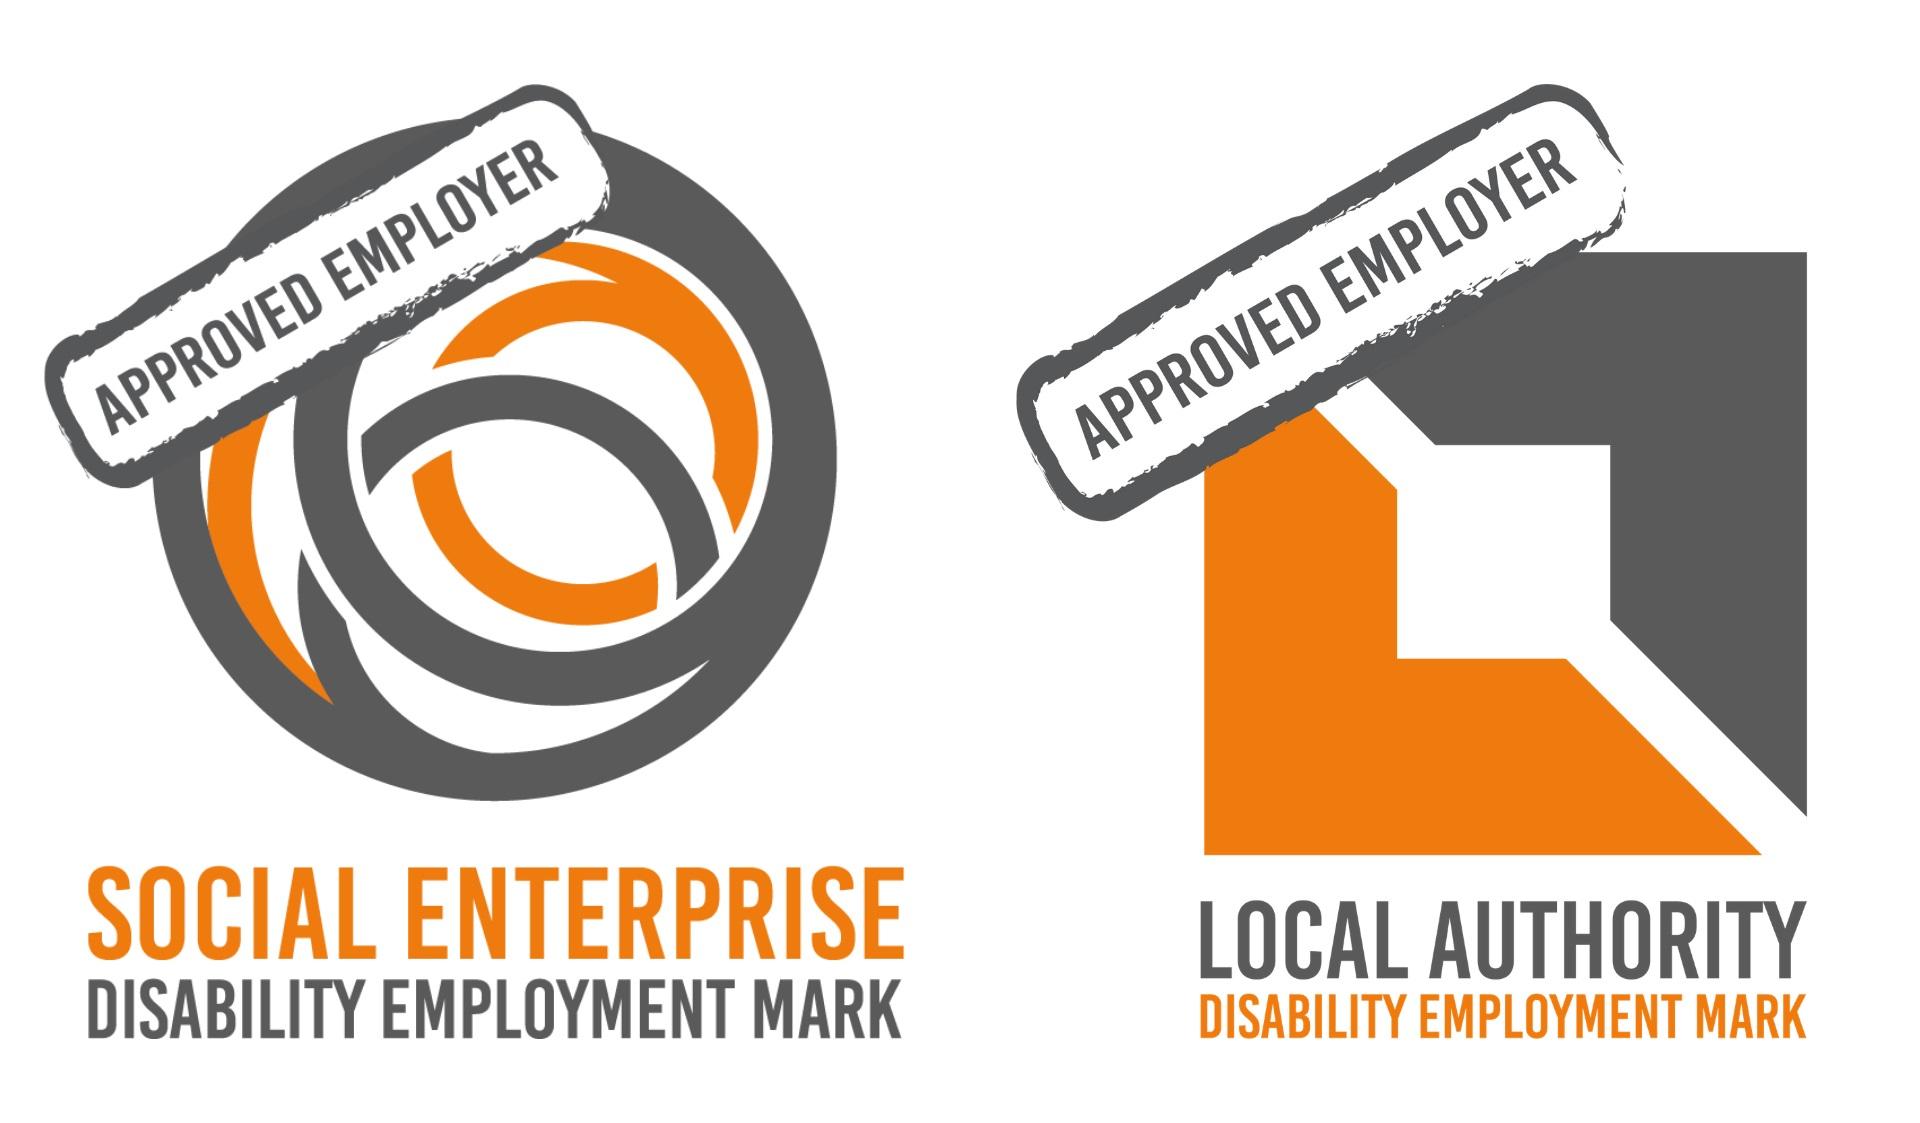 Social Enterprise Mark CIC disability employment marks